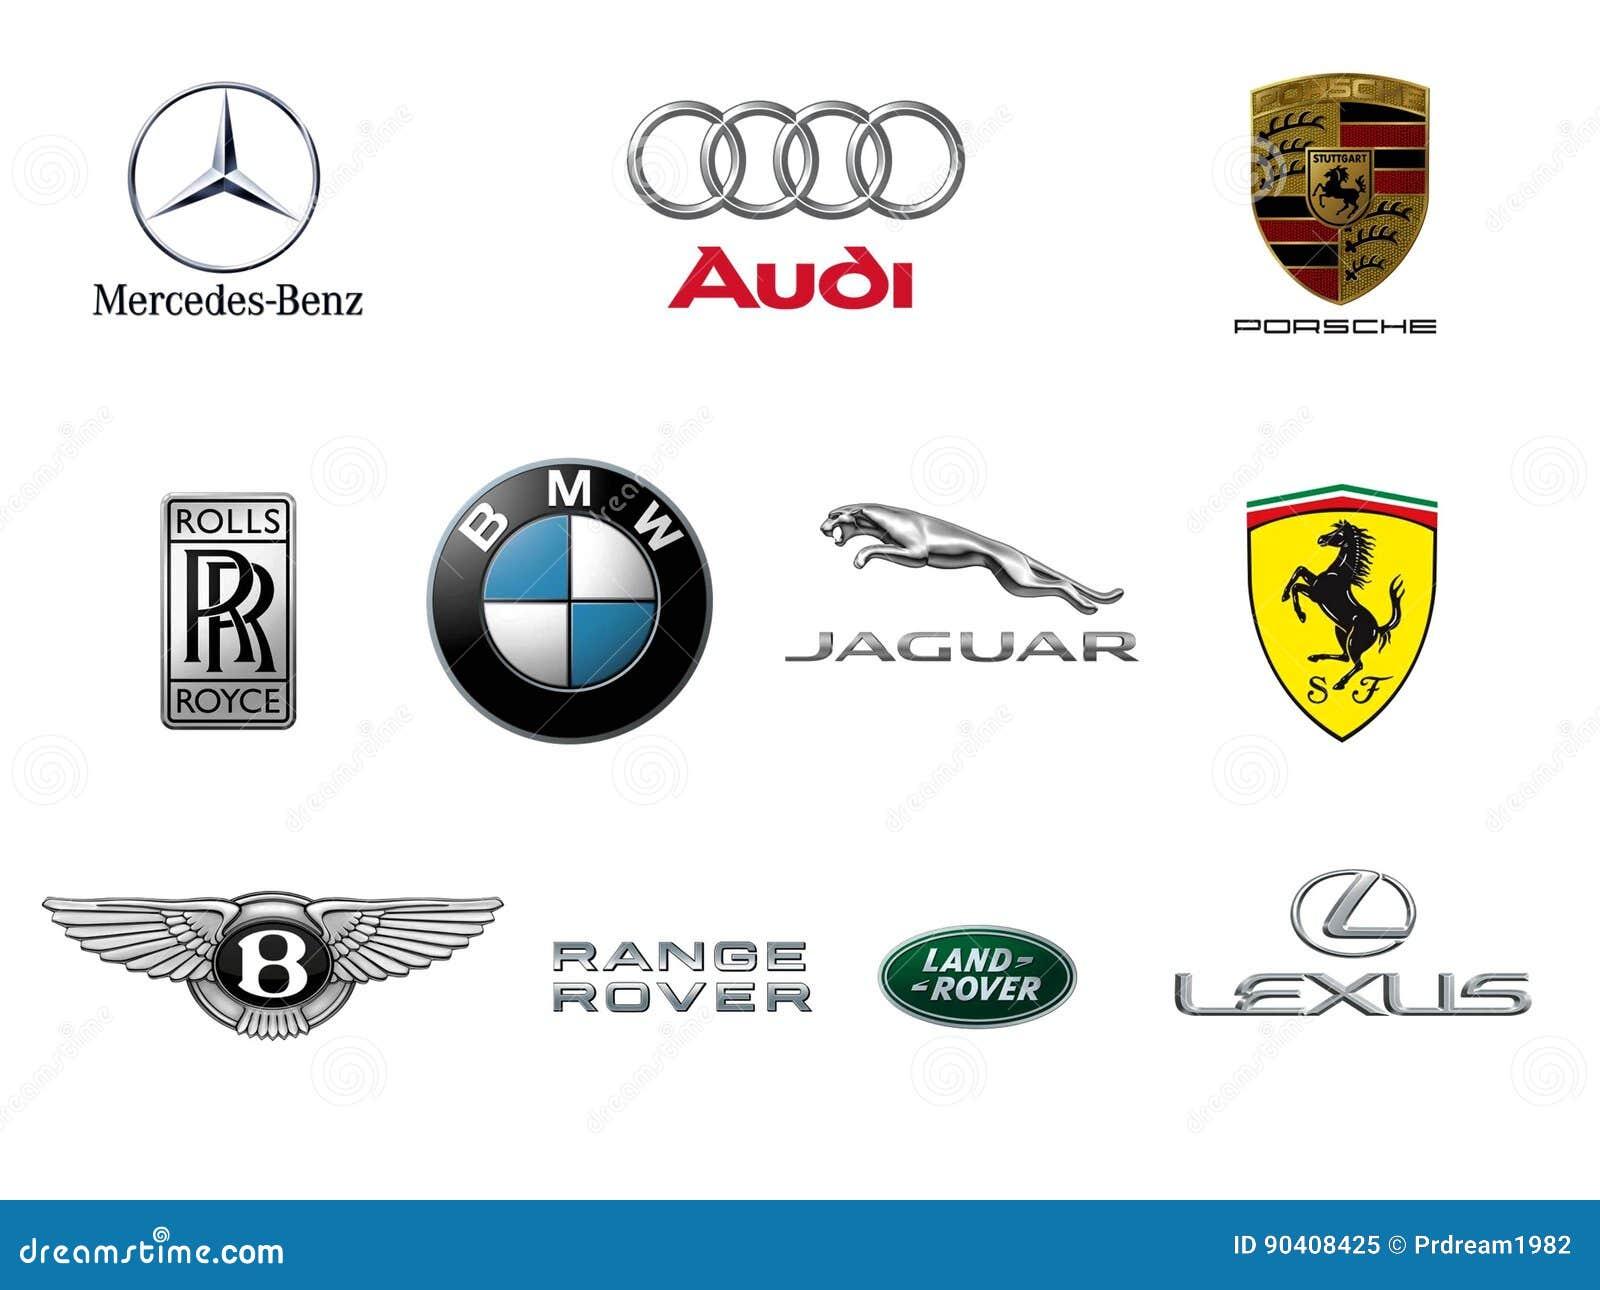 Luxury Car Brand Logos Editorial Image Illustration Of